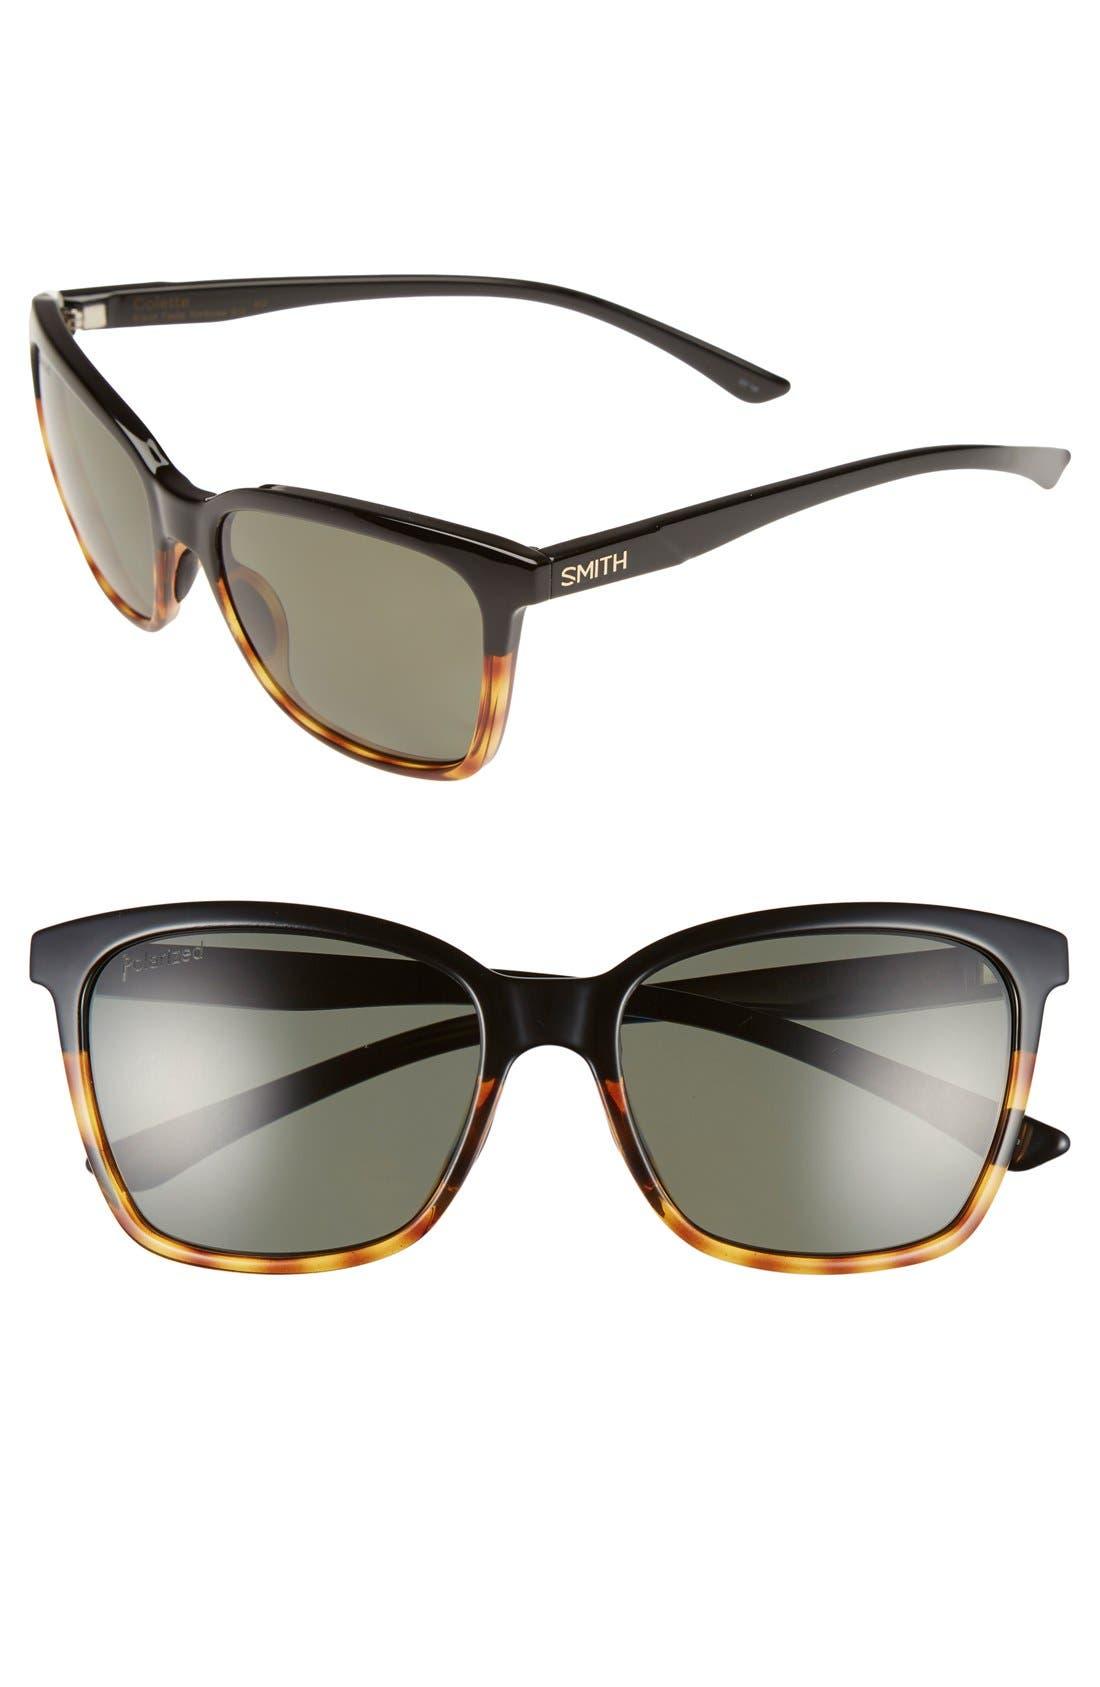 Smith 'Colette' 55mm Polarized Sunglasses